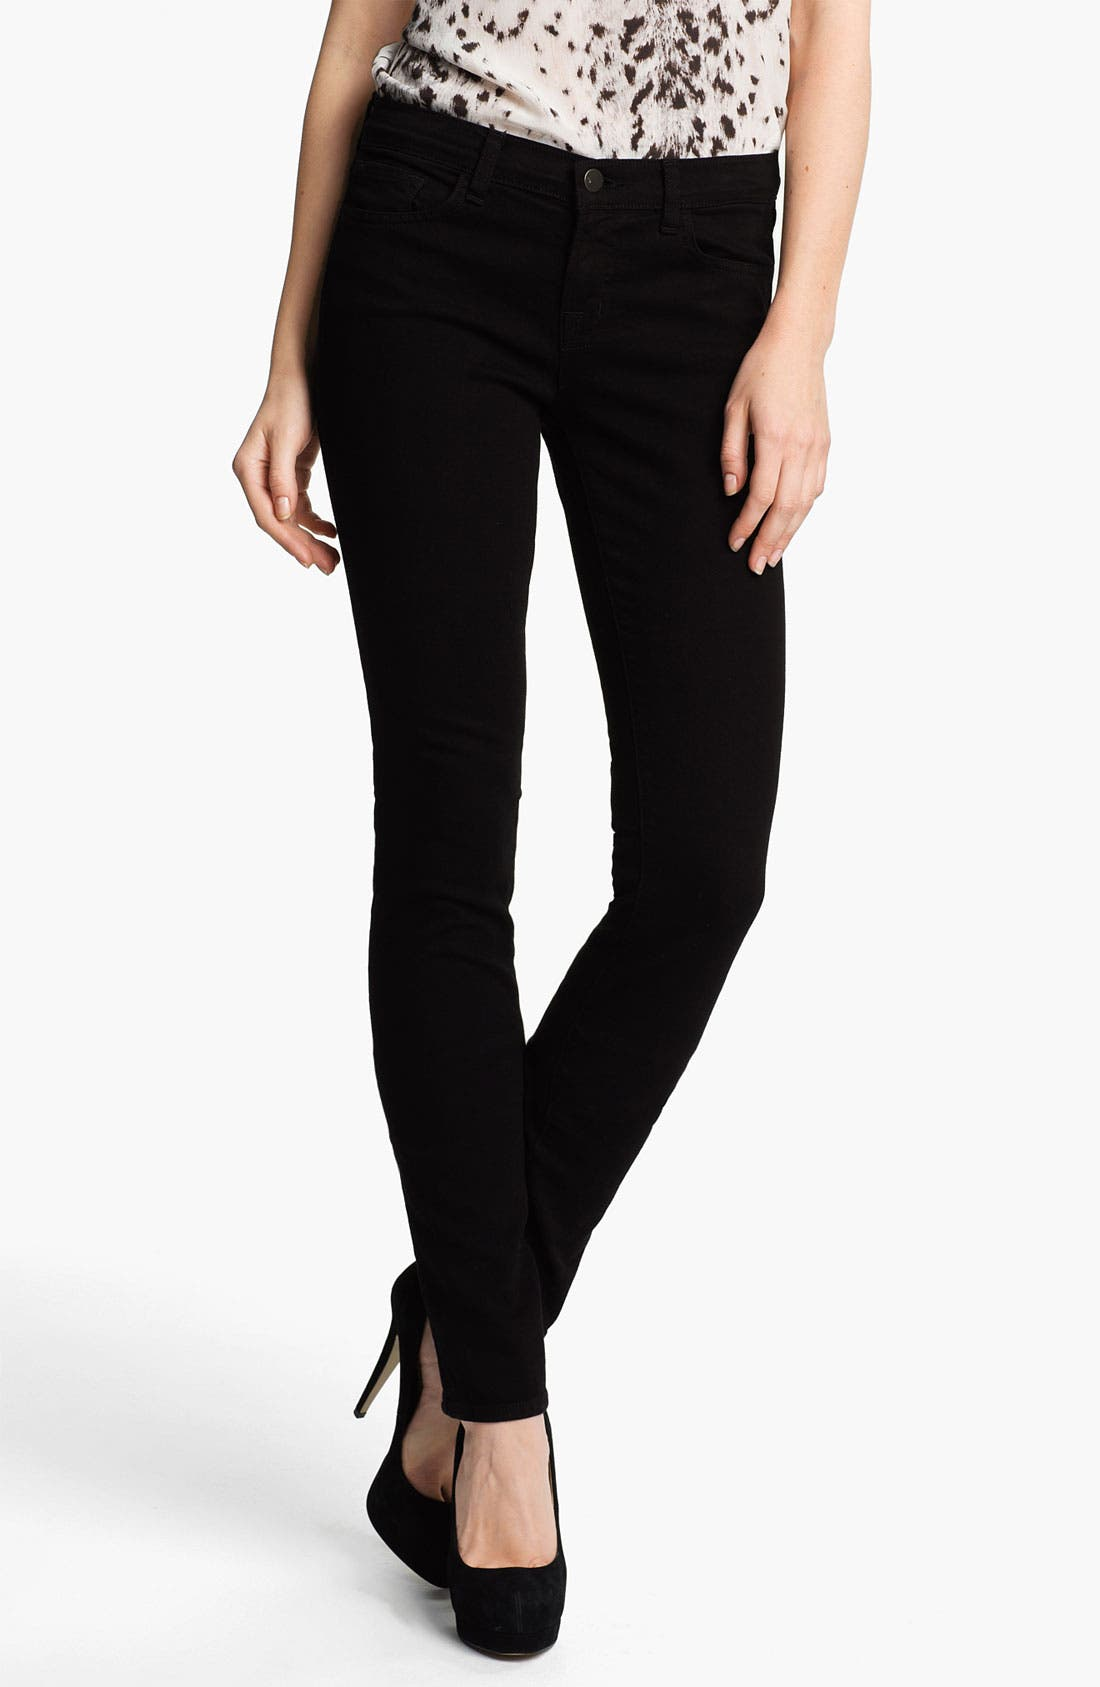 Main Image - J Brand 'Pencil Leg' Stretch Jeans (Shadow)